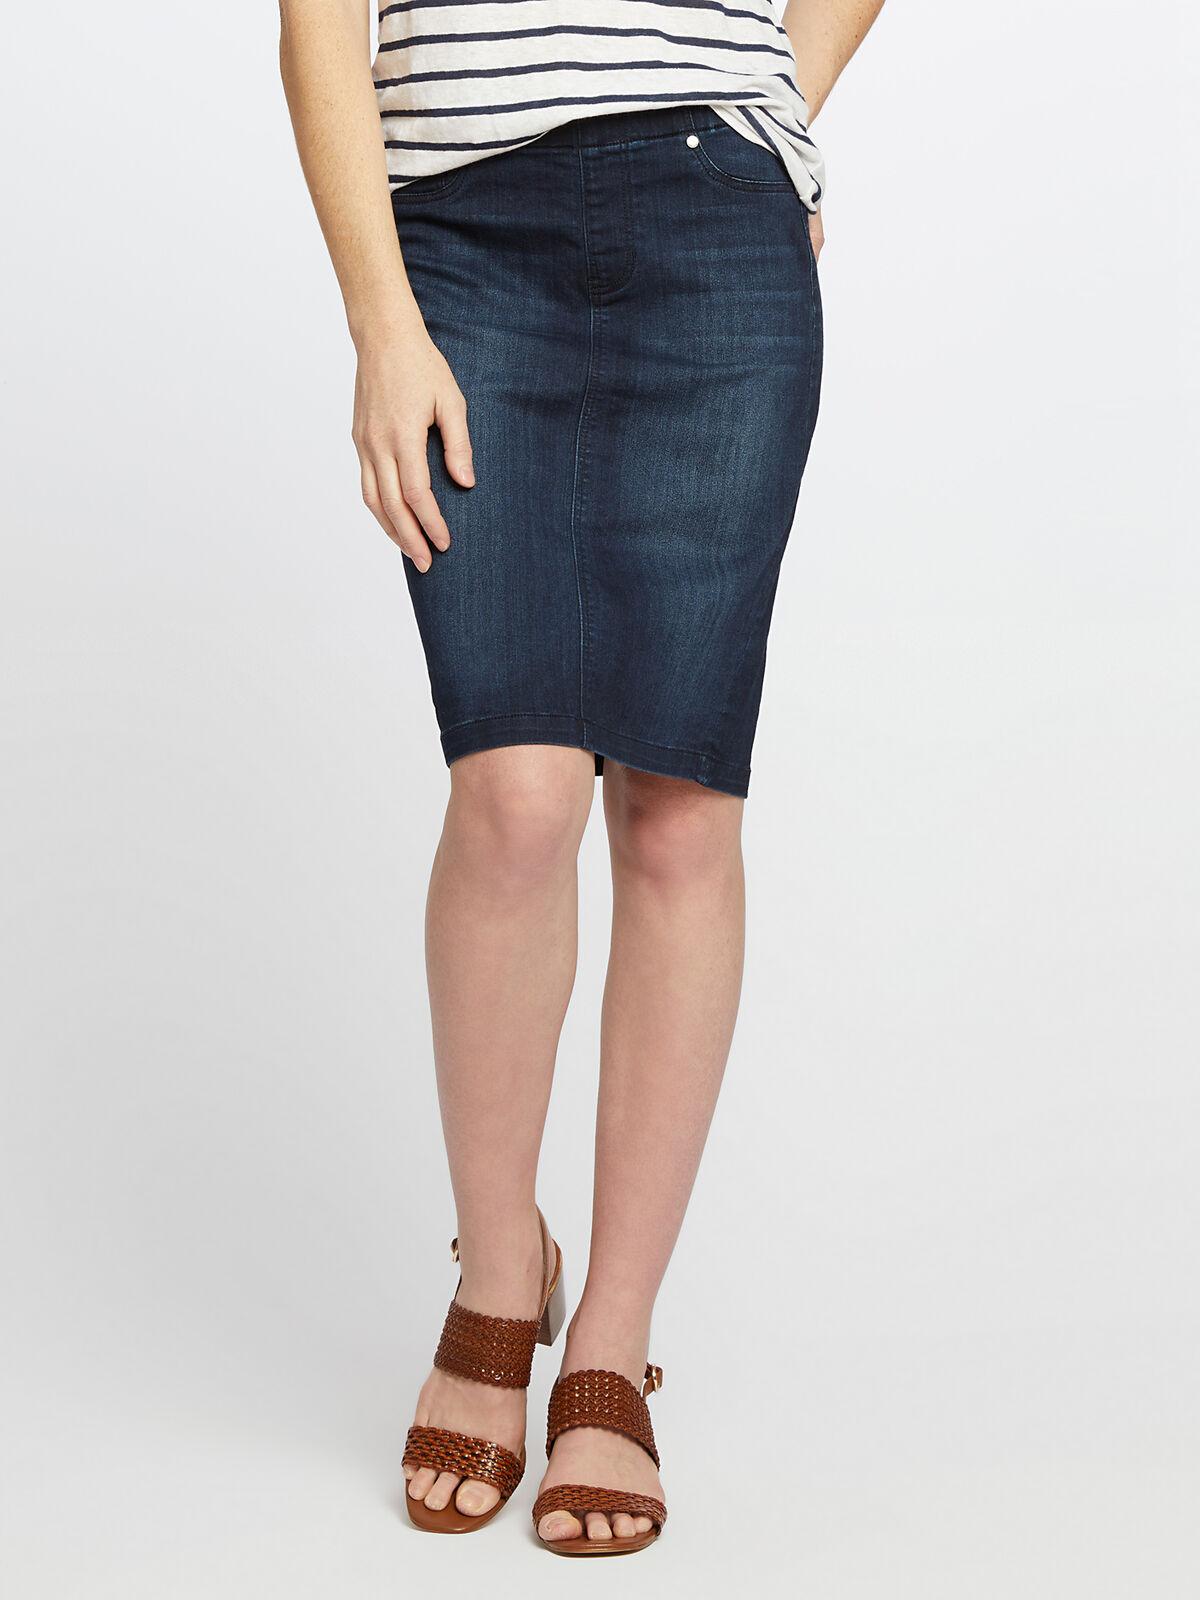 Liverpool - Pull-On Pencil Skirt